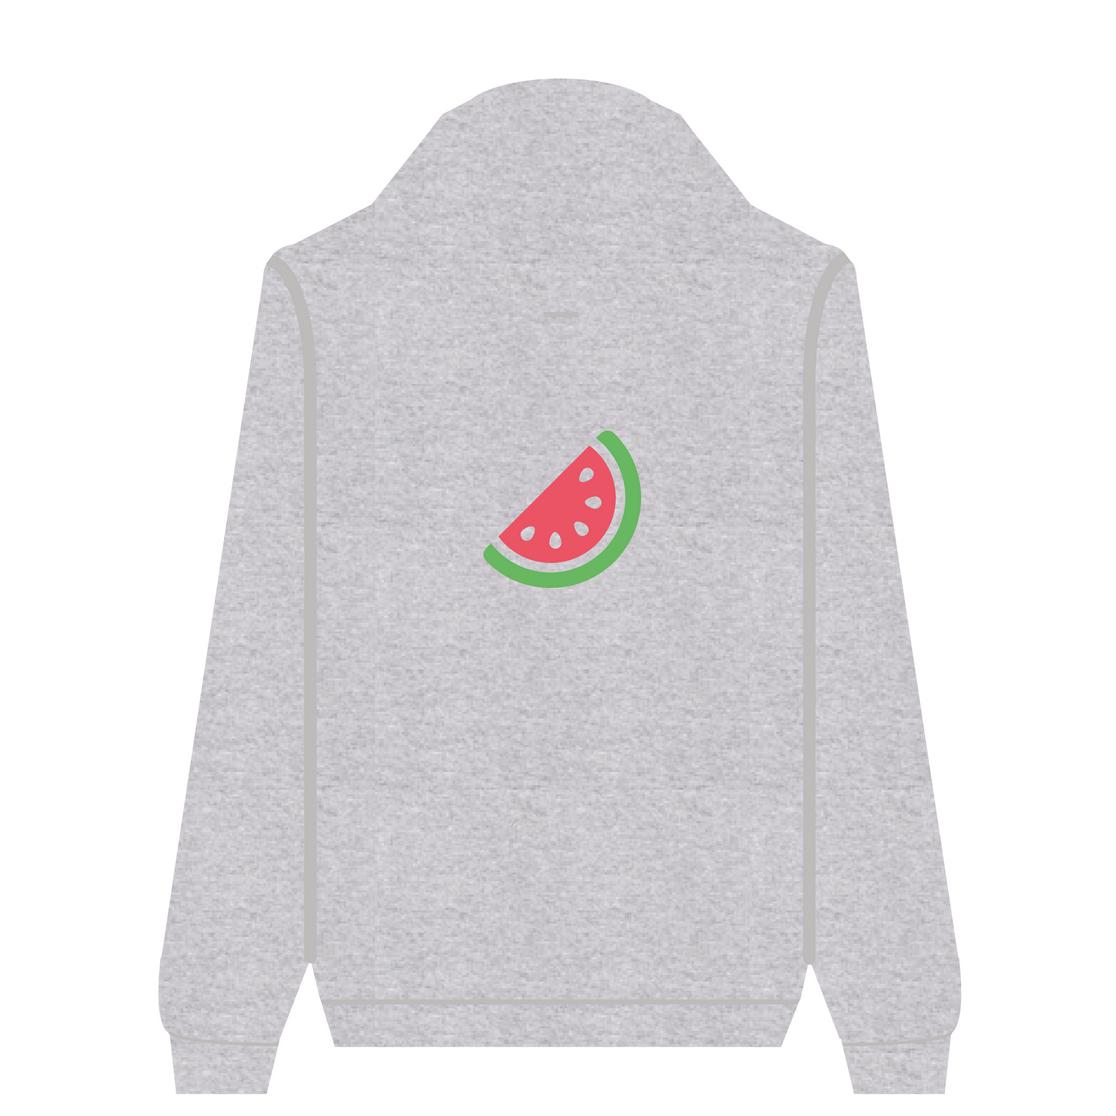 Full Zip Hoodie Watermelon | Wuzzee